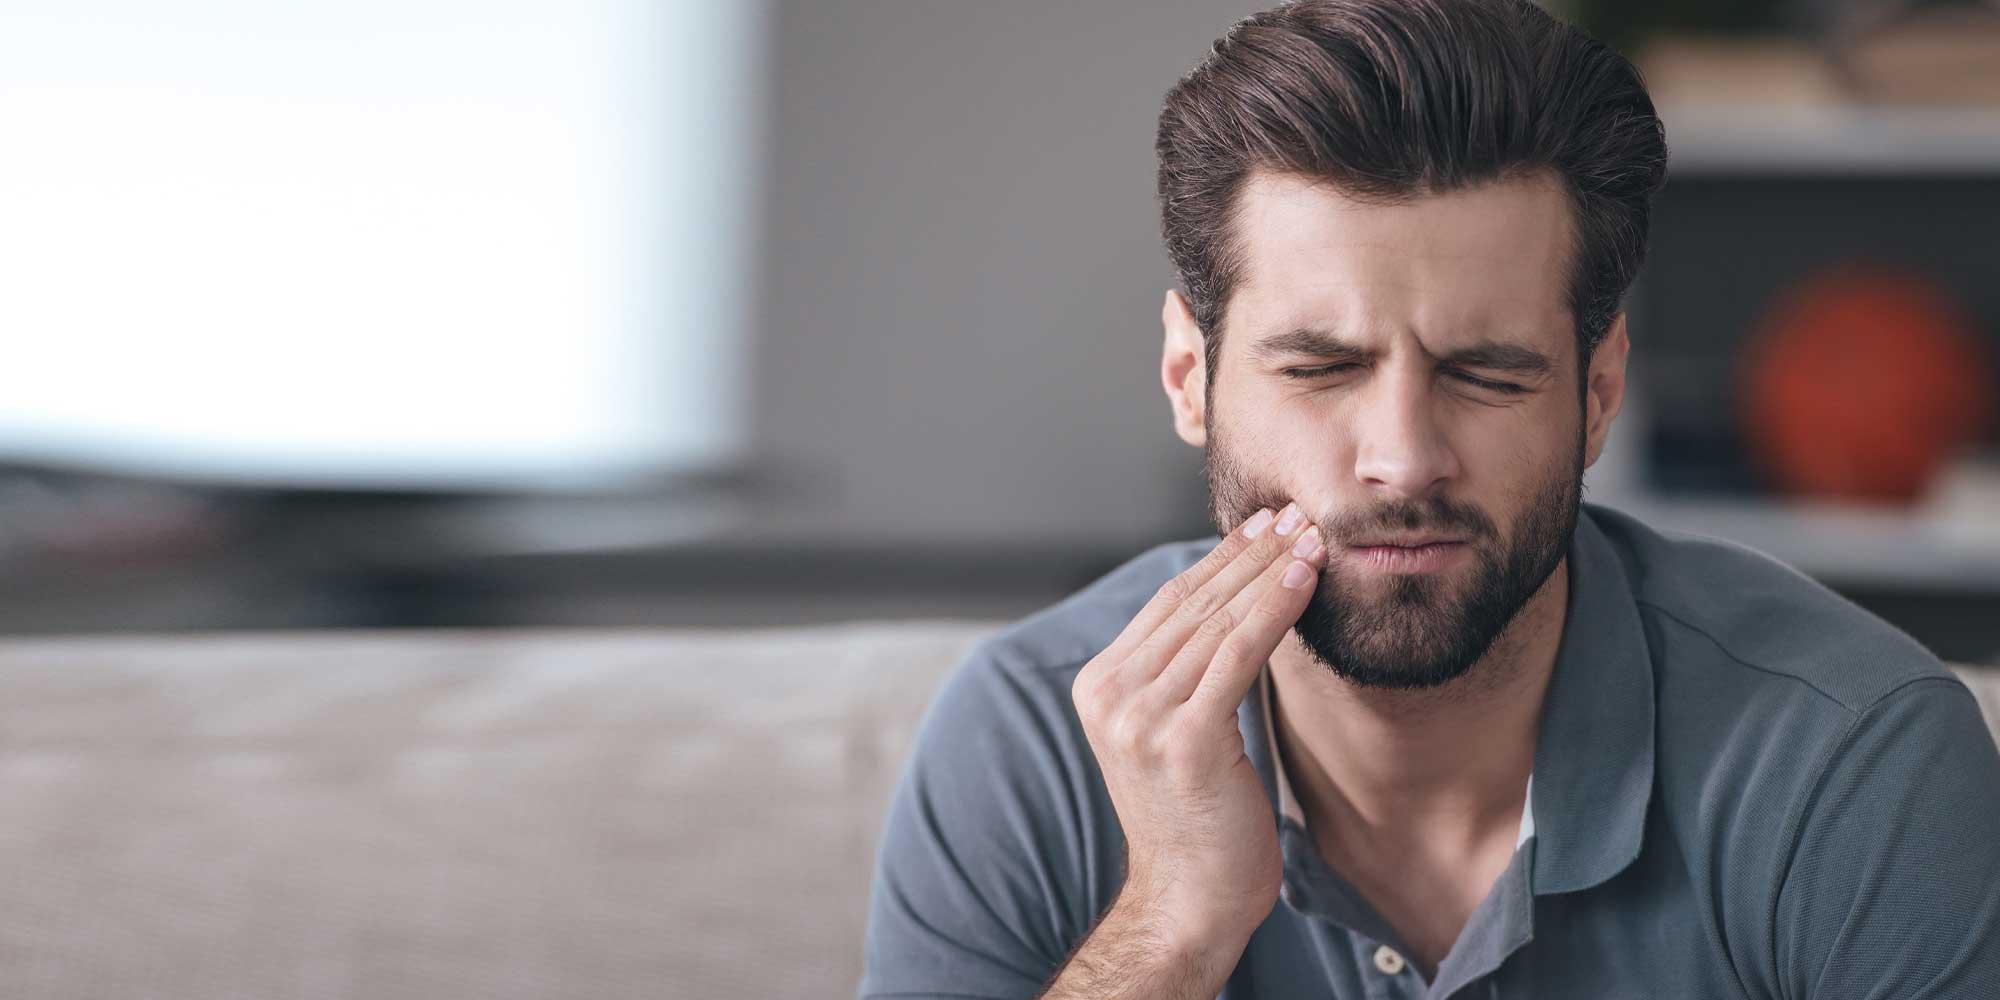 patient experiencing toothache